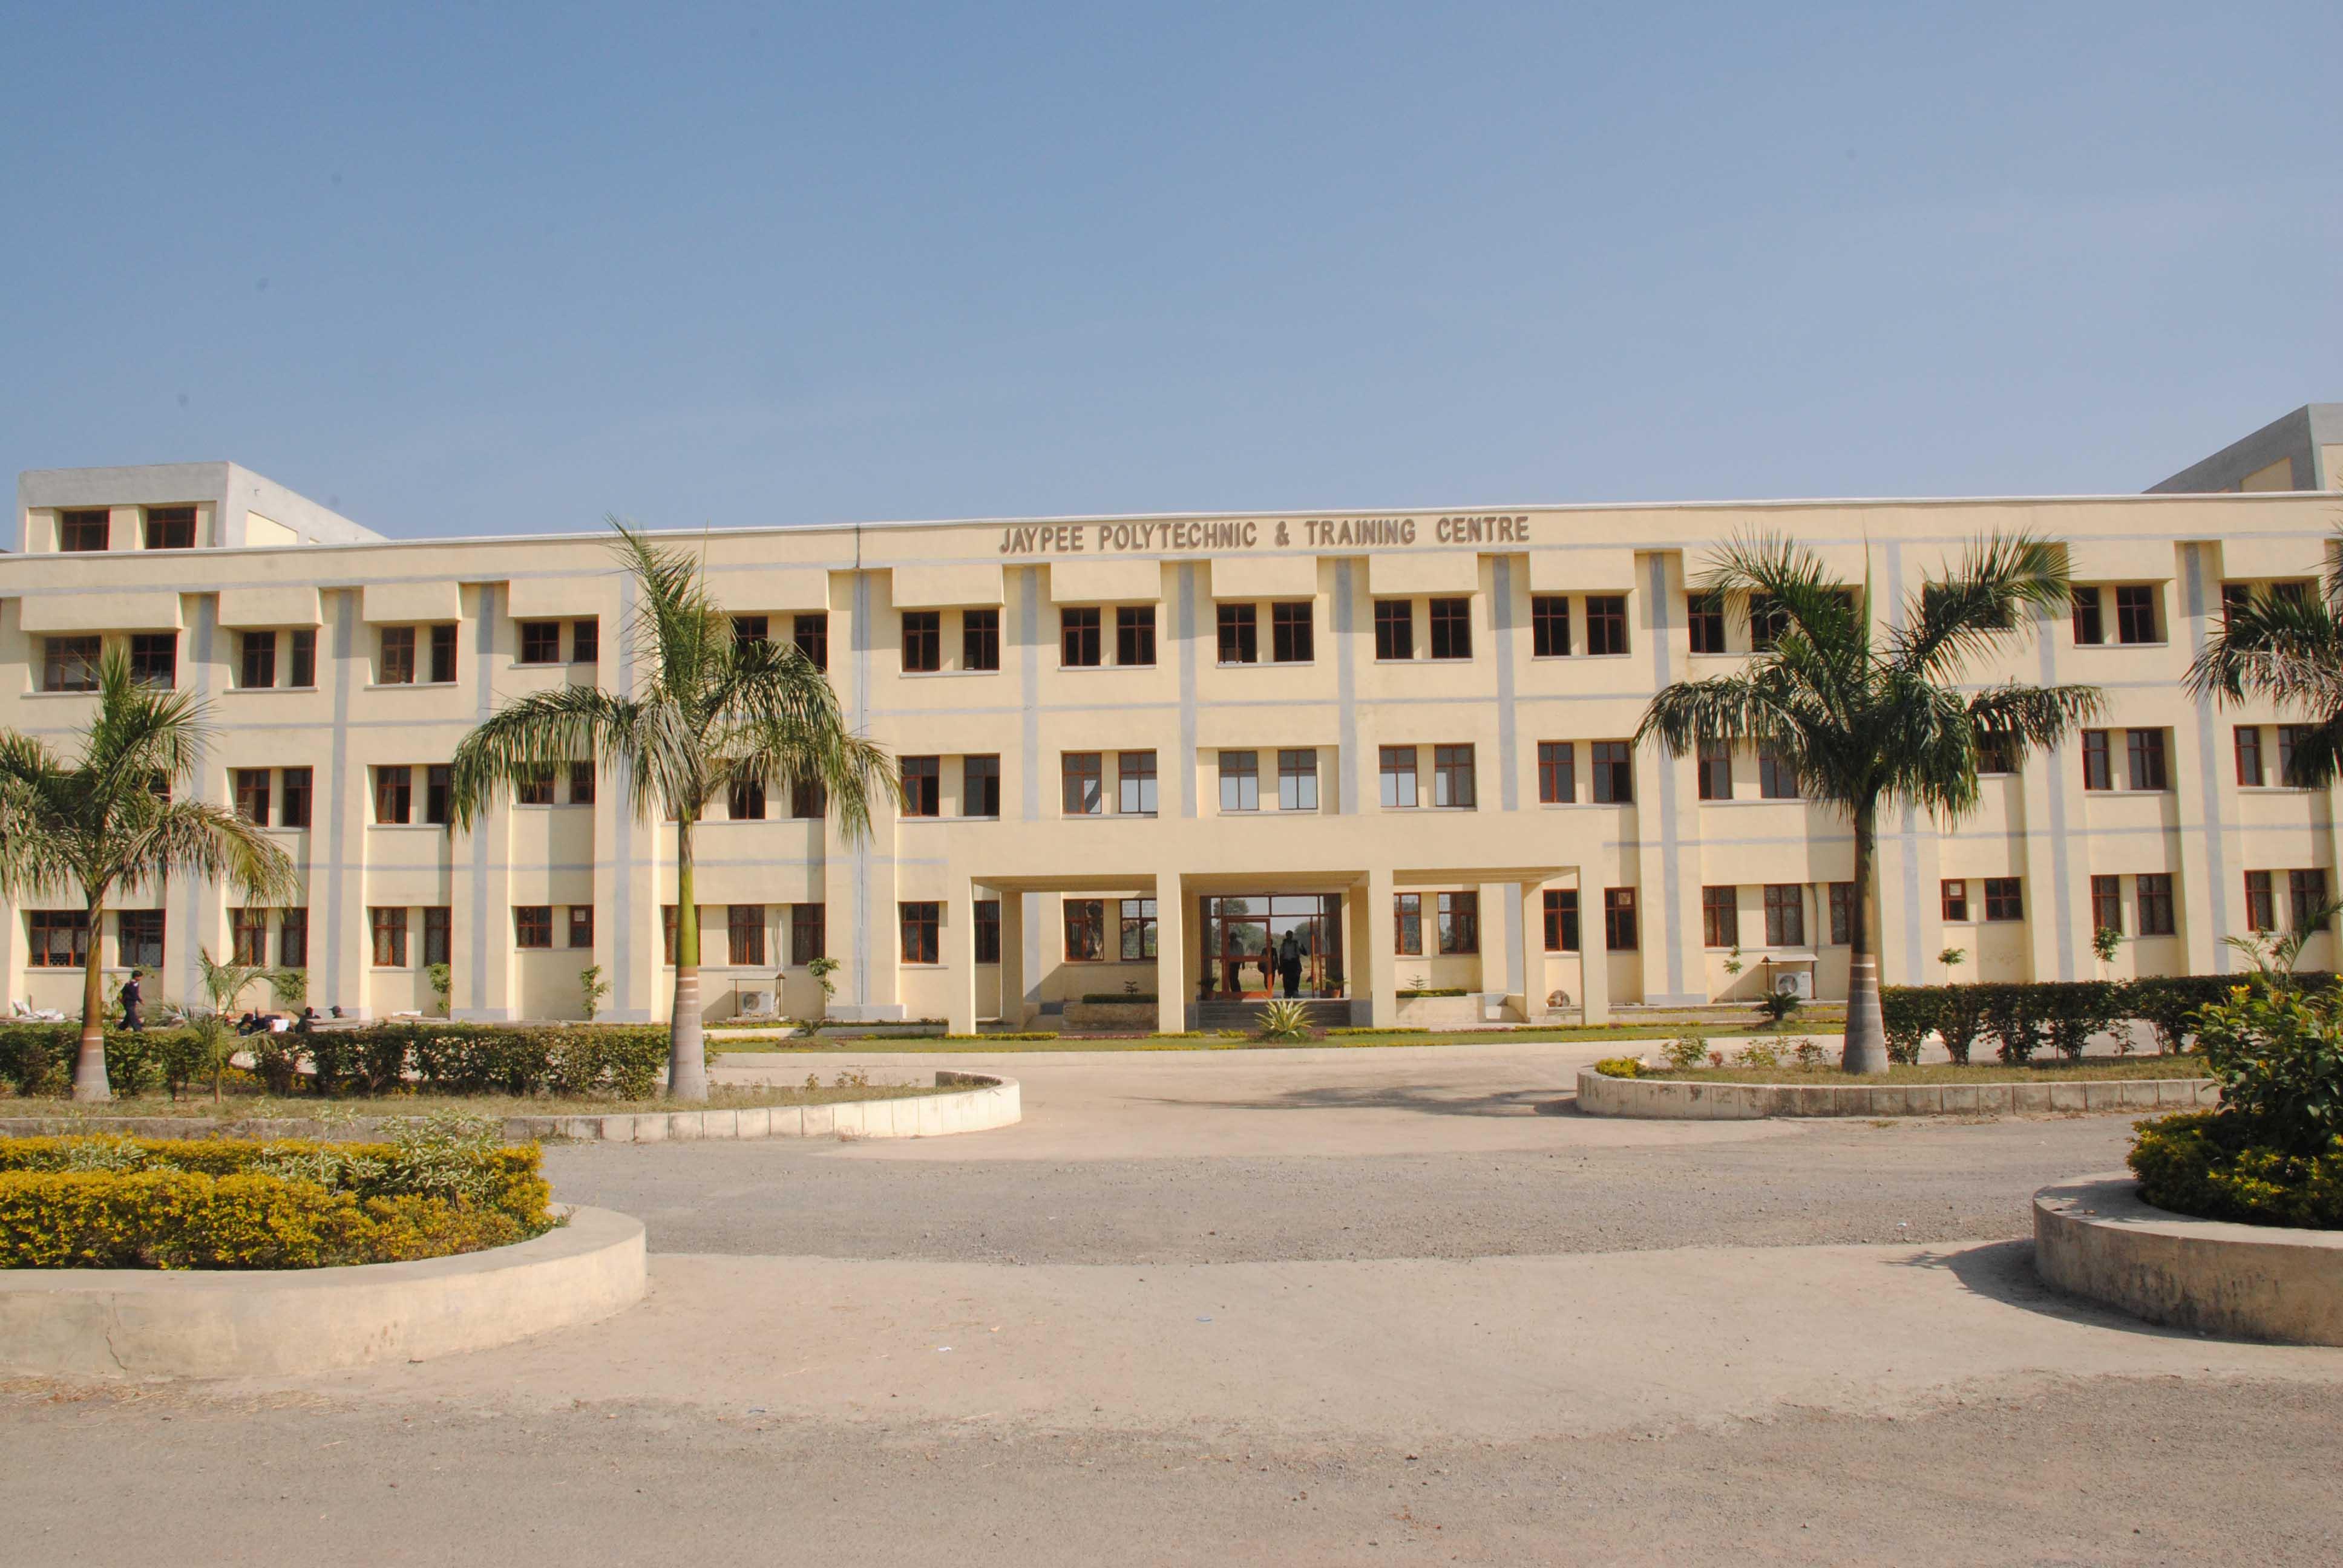 Jaypee Polytechnic and Training Centre